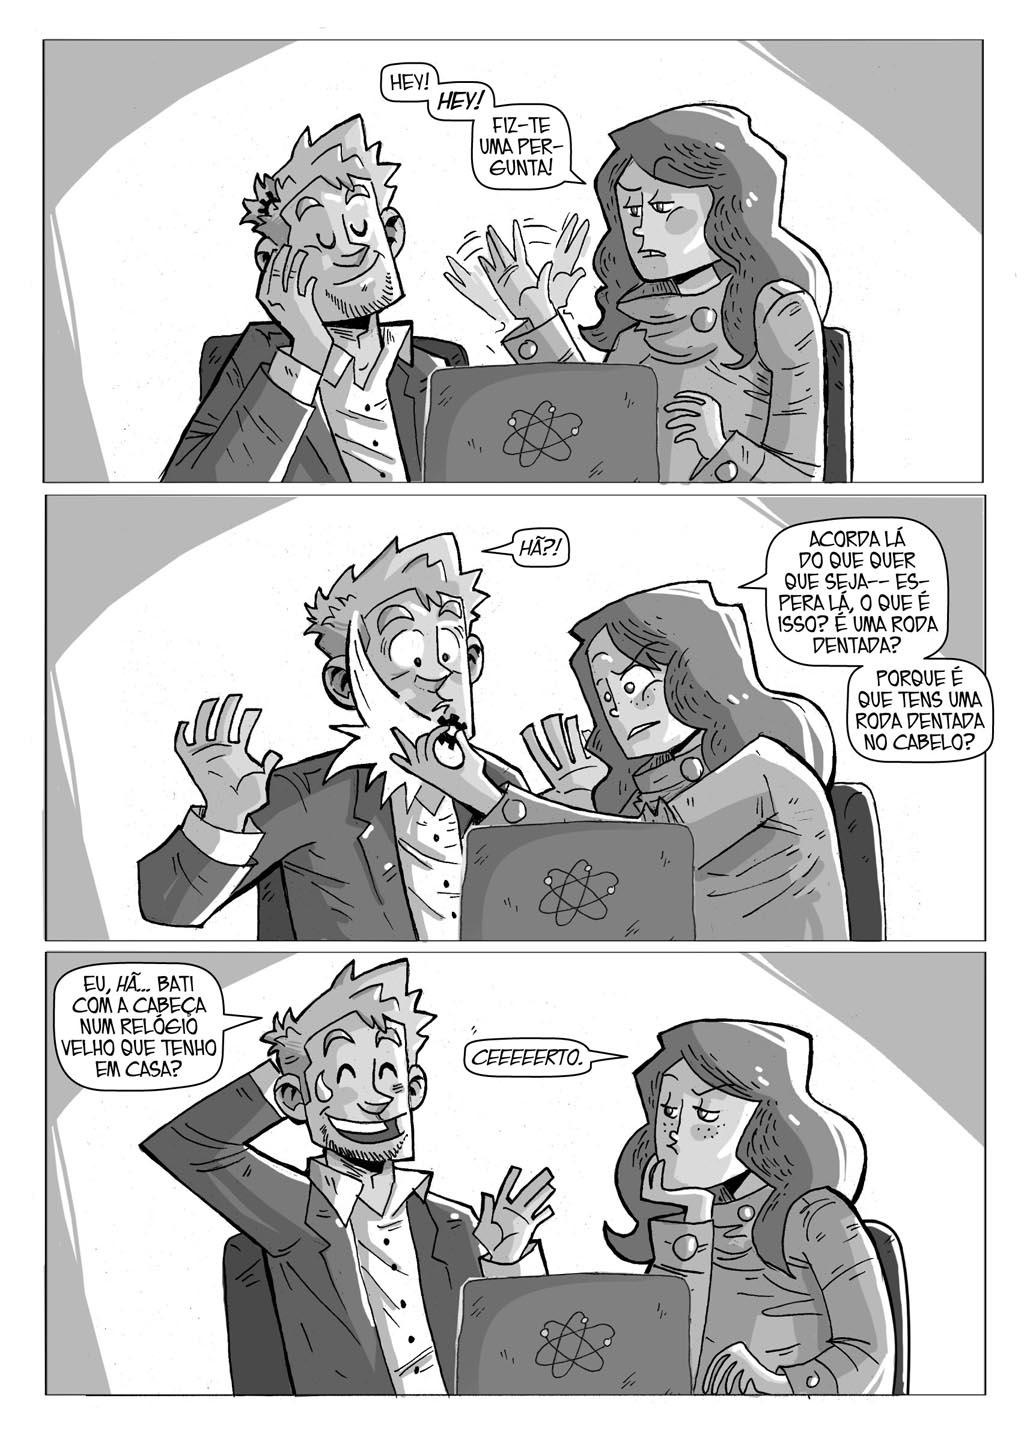 Portento - Página 24